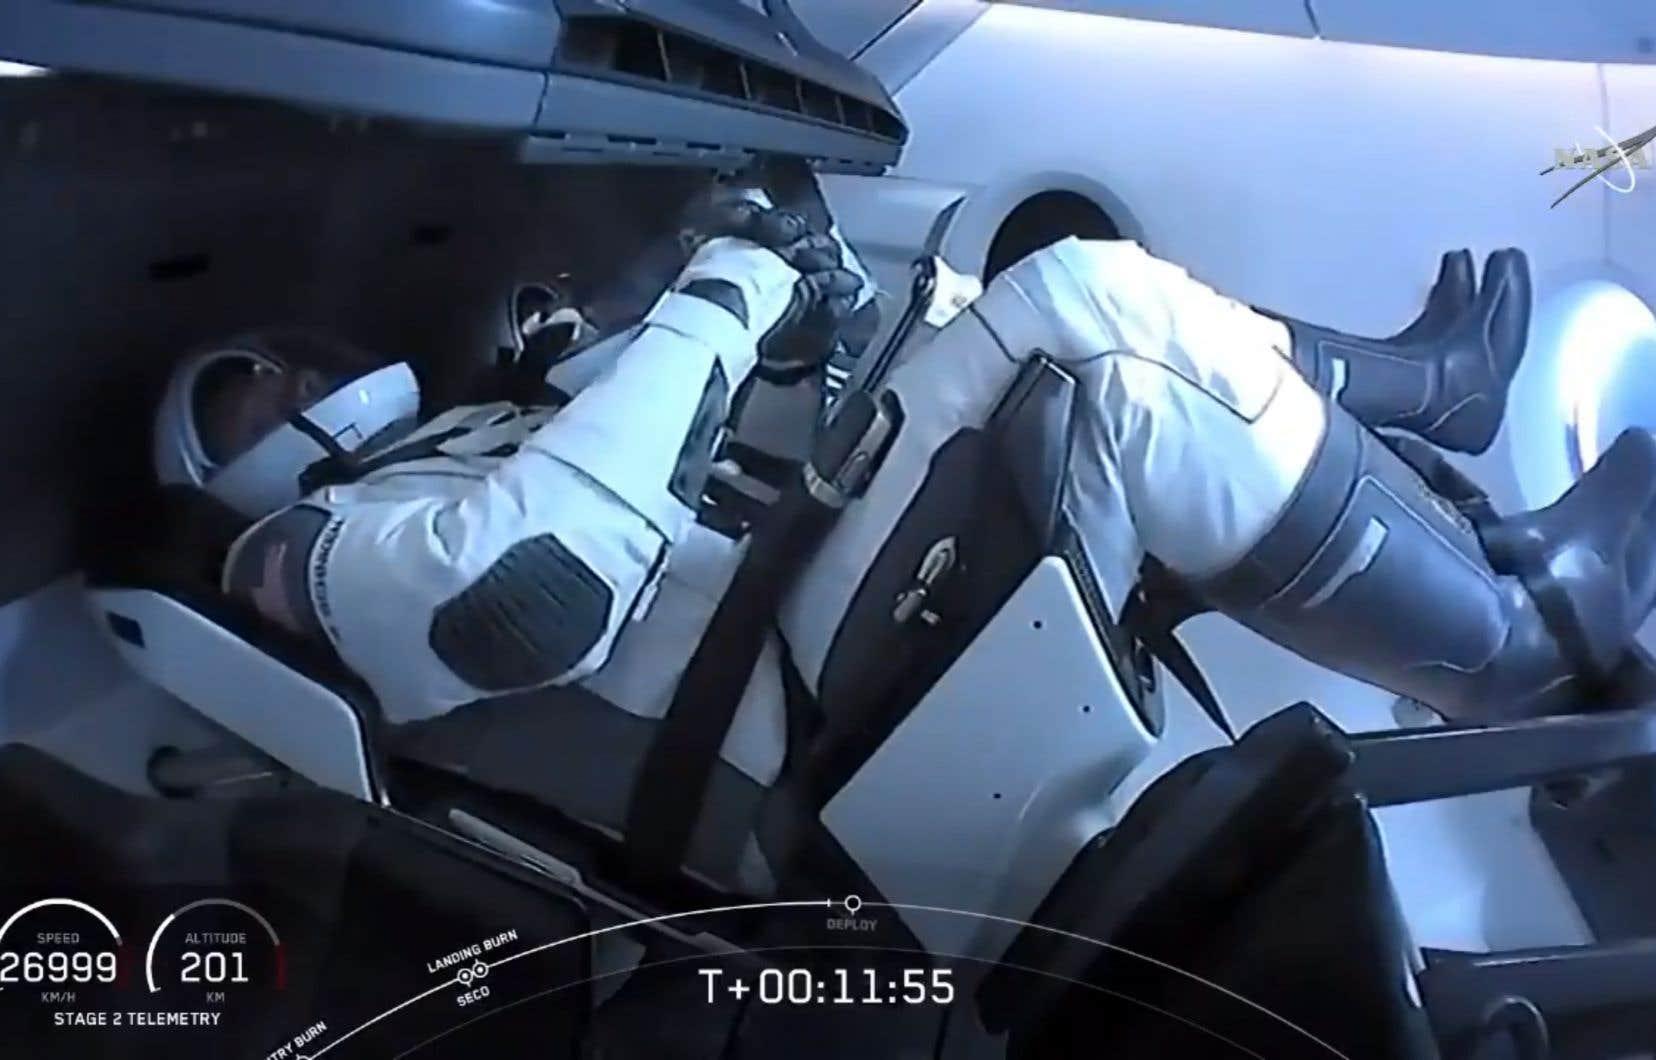 Les astronautes de la NASA Bob Behnken et Doug Hurley ont décollé samedi le 30 mai 2020 depuis le Kennedy Space Center en Floride.